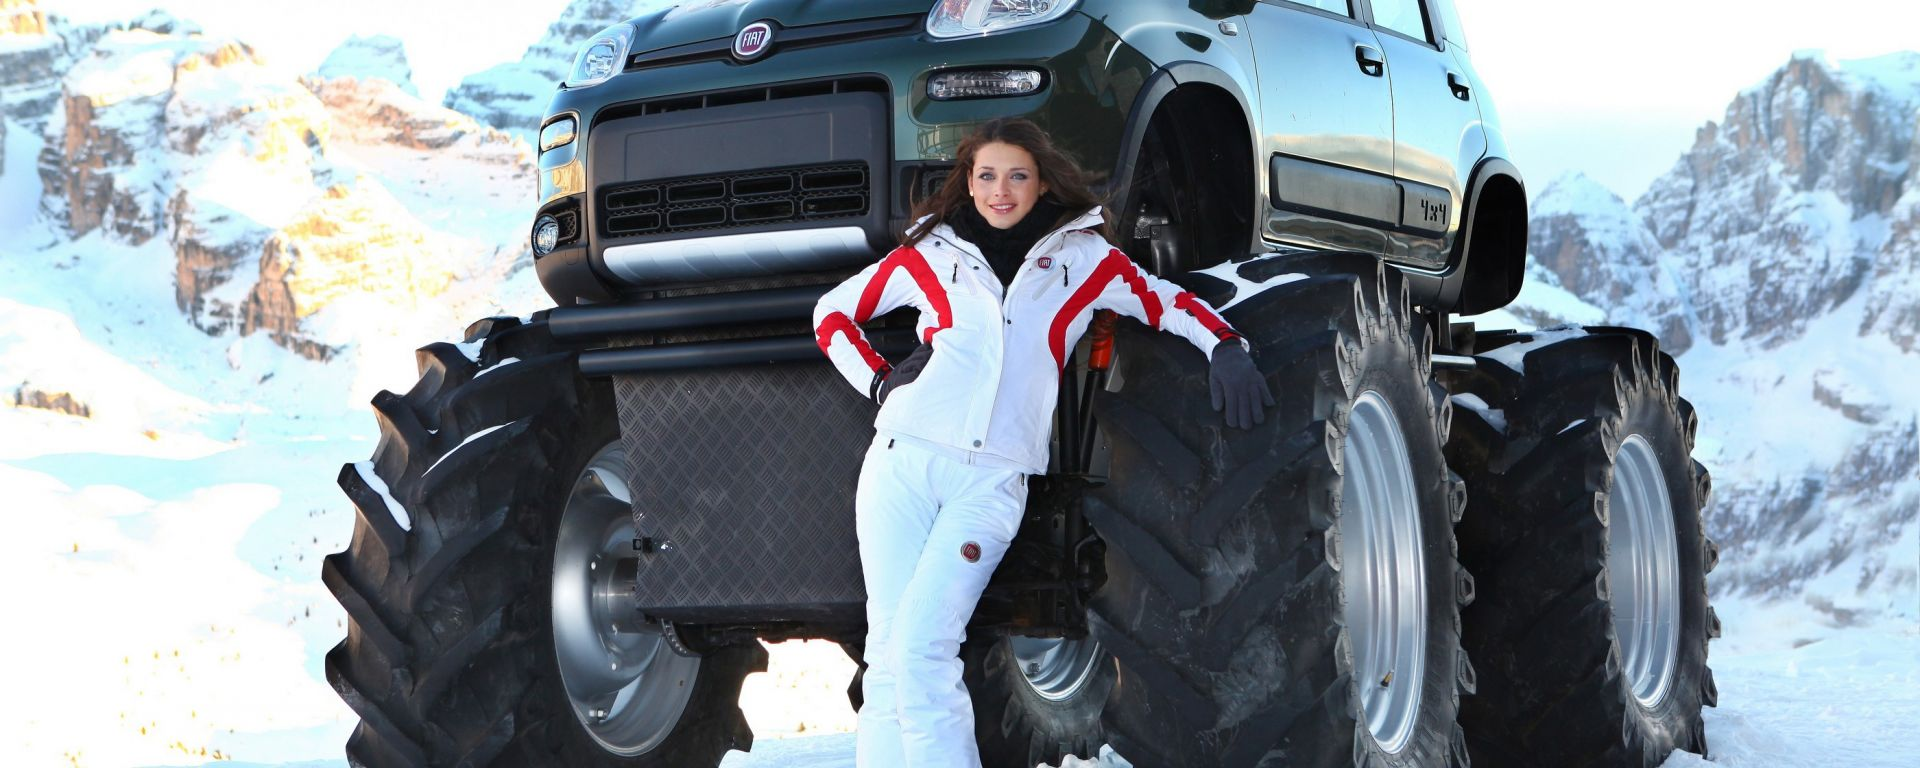 Fiat Panda Monster Truck, nuove immagini